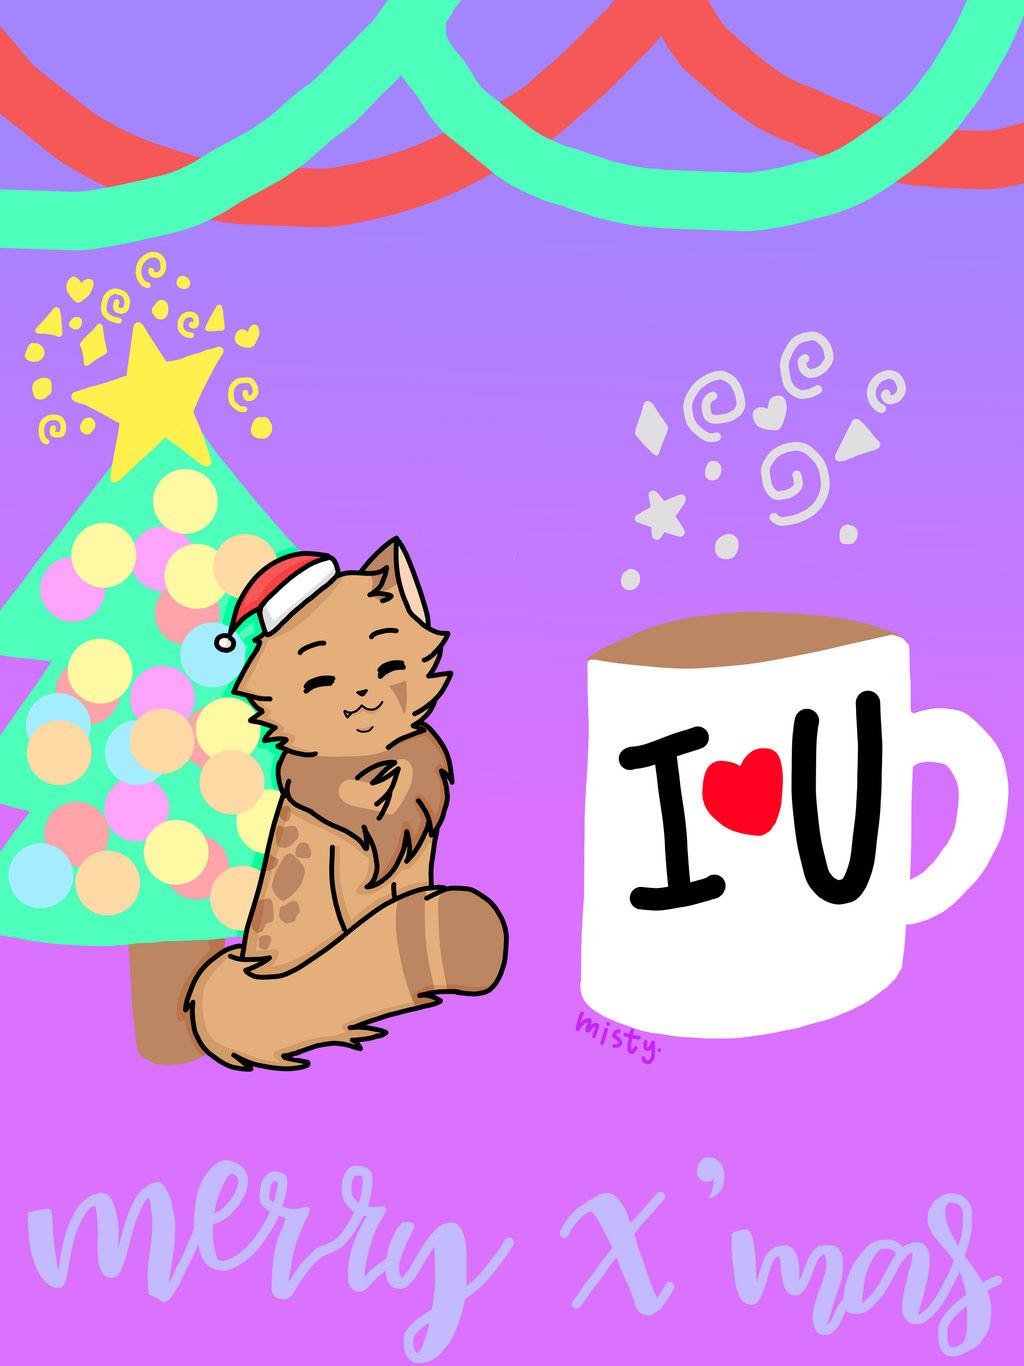 Christmas cheer by Feathermist328